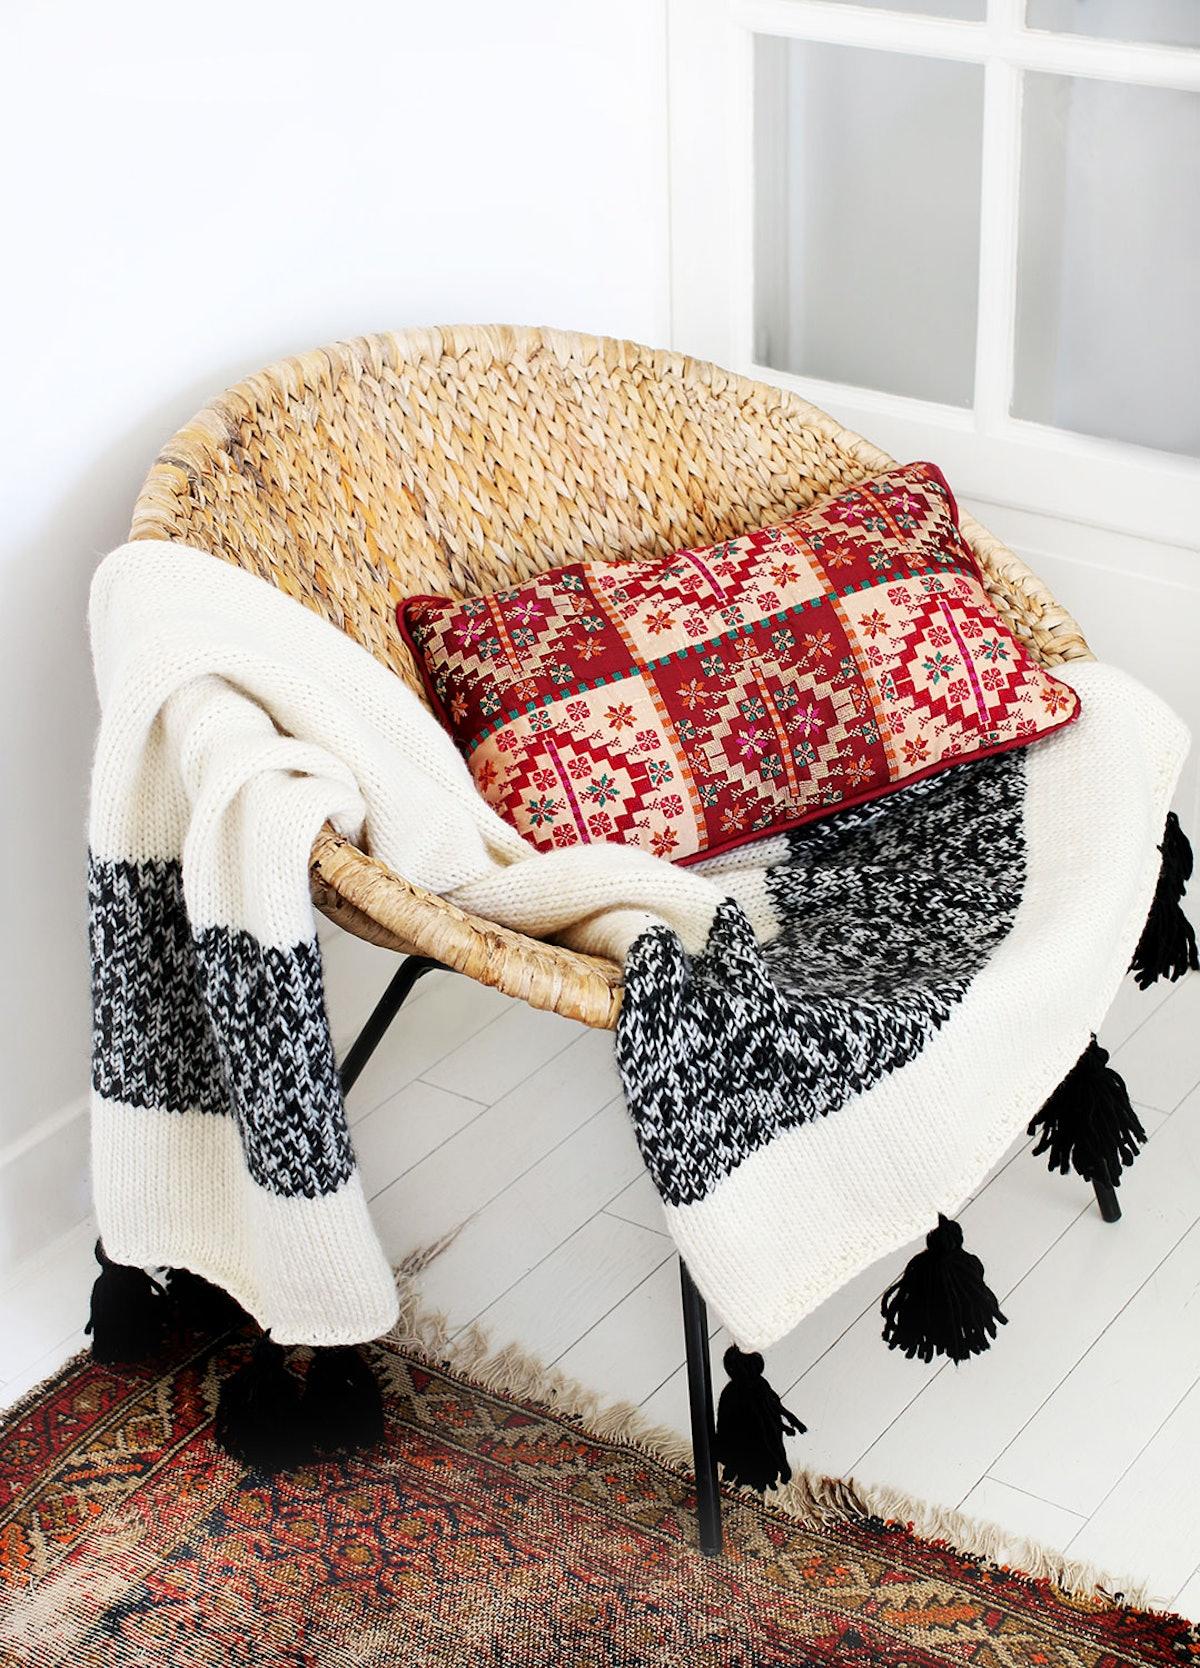 The Kilim Blanket Knitting Kit